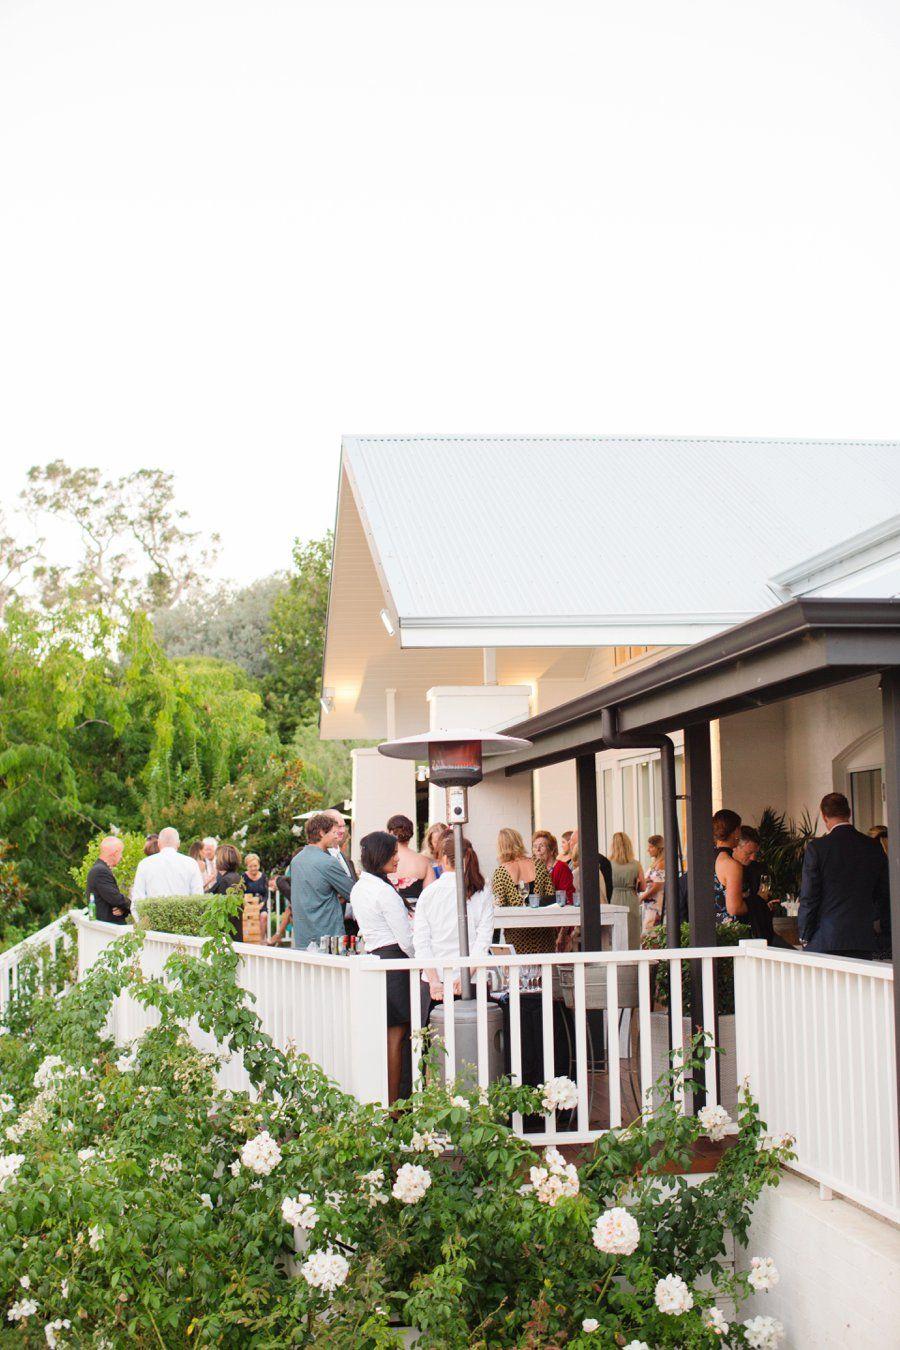 best outdoor wedding venues perth%0A Winery wedding at aravina estate  yallingup  Angela Higgins  Wedding  Photographer  Perth Australia